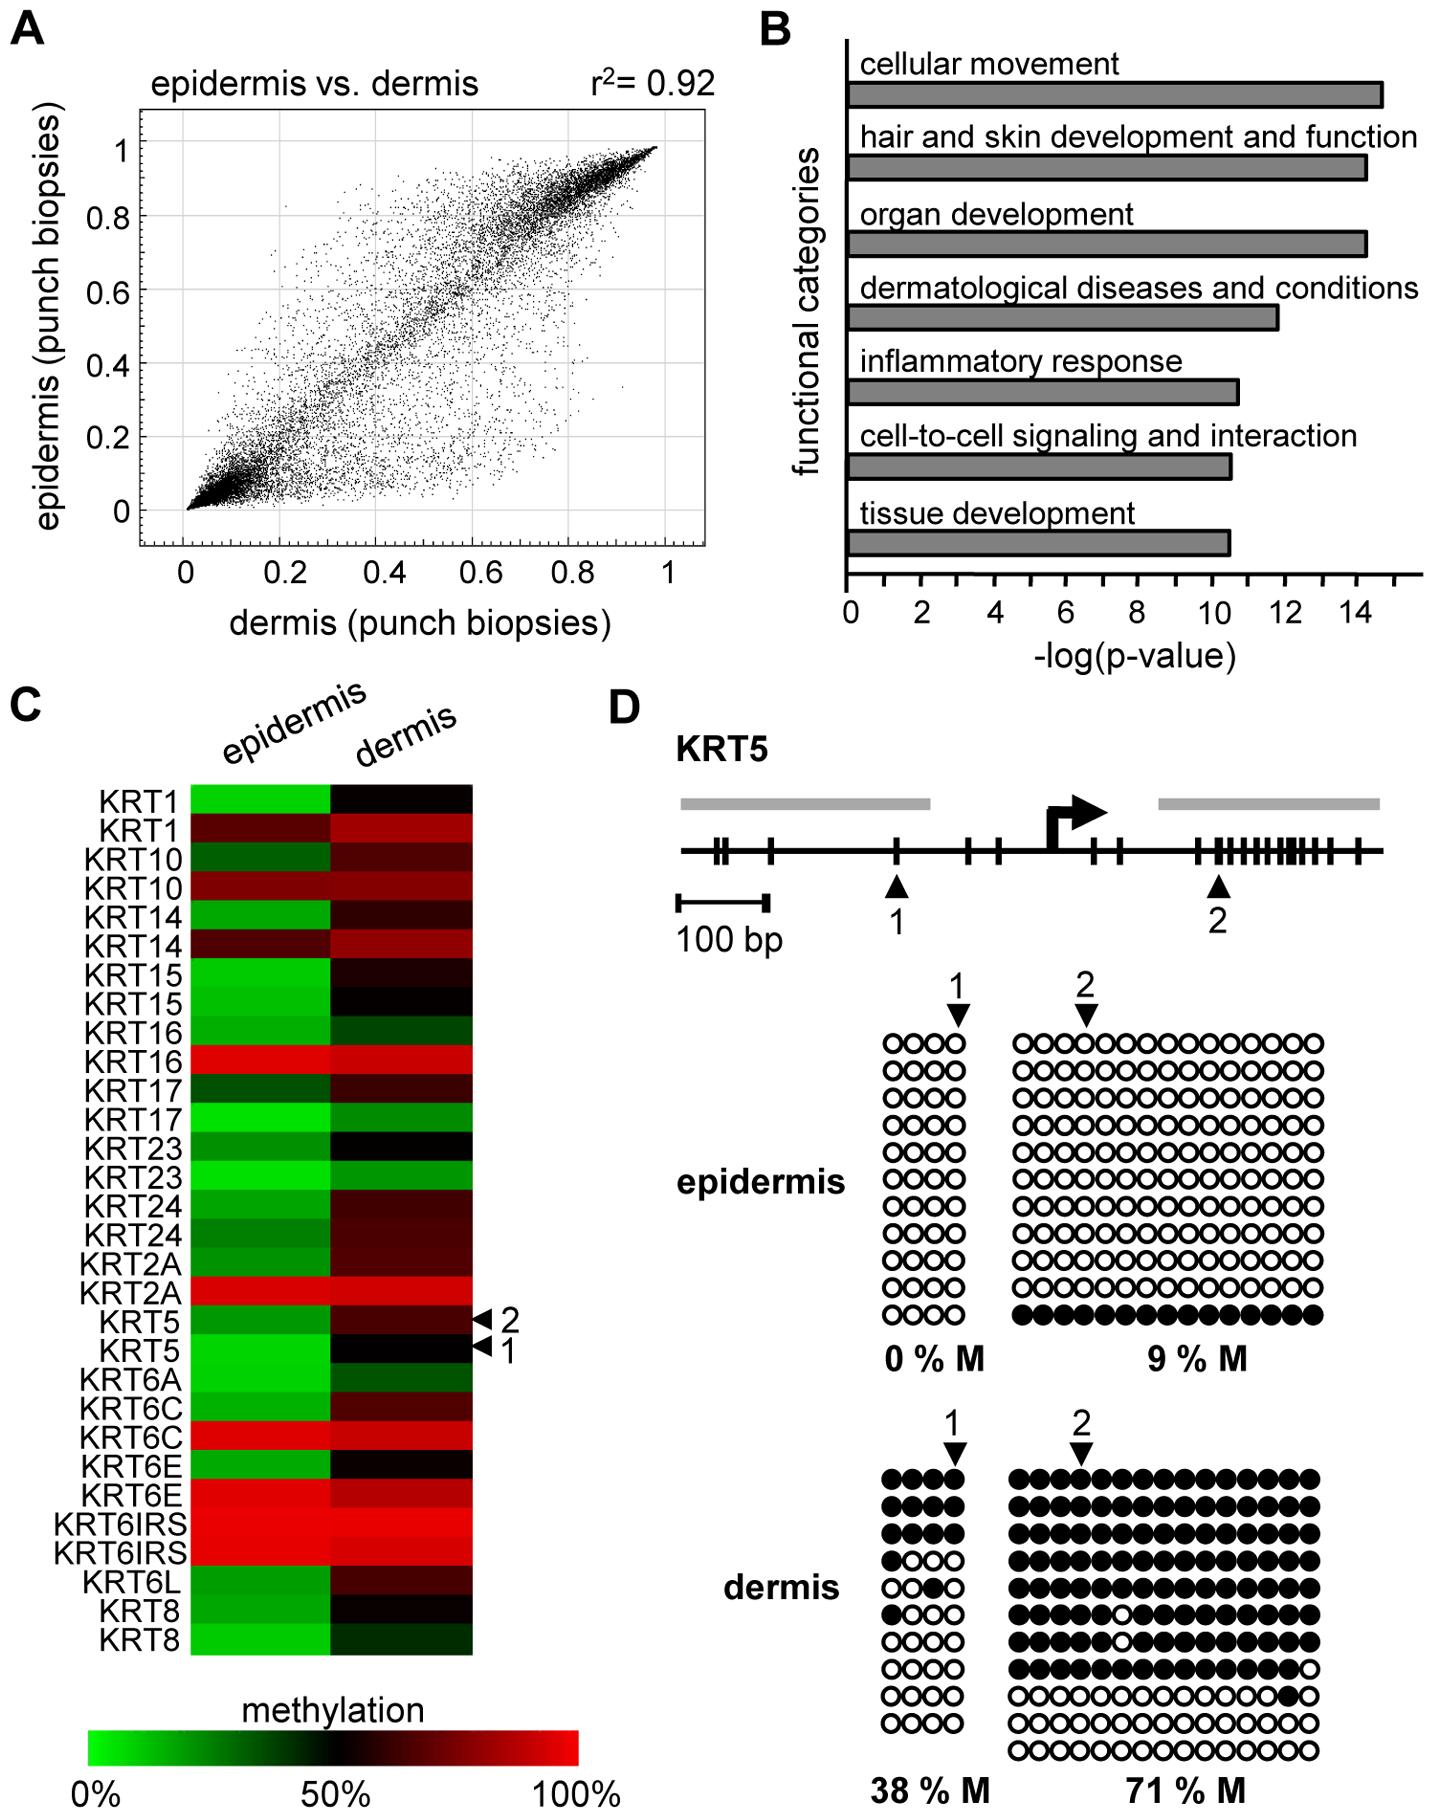 Distinct DNA methylation patterns of human epidermis and dermis.